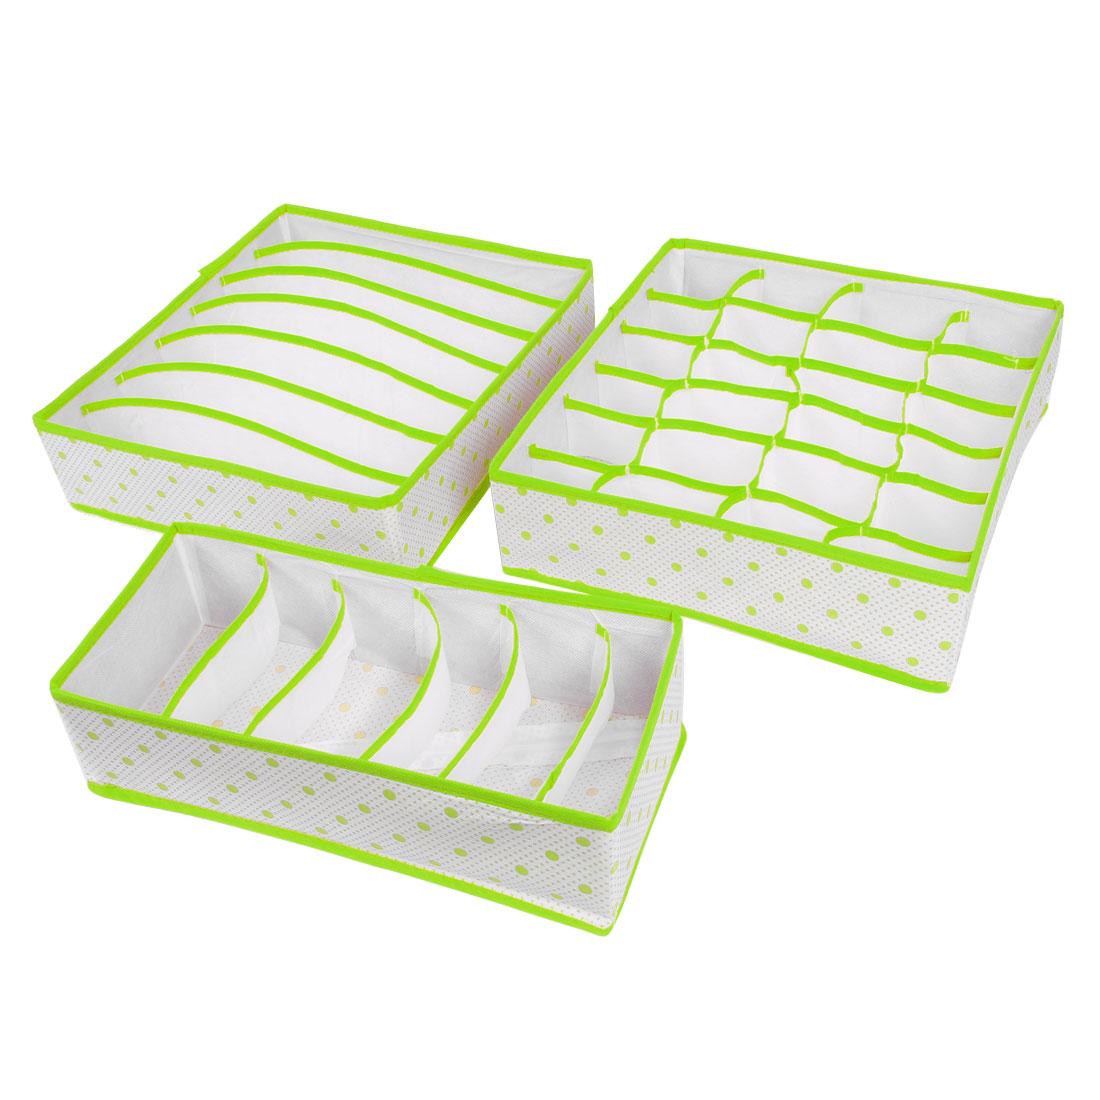 Non-woven Fabric Dot Print Foldable Socks Underwear Storage Box Green 3 in 1